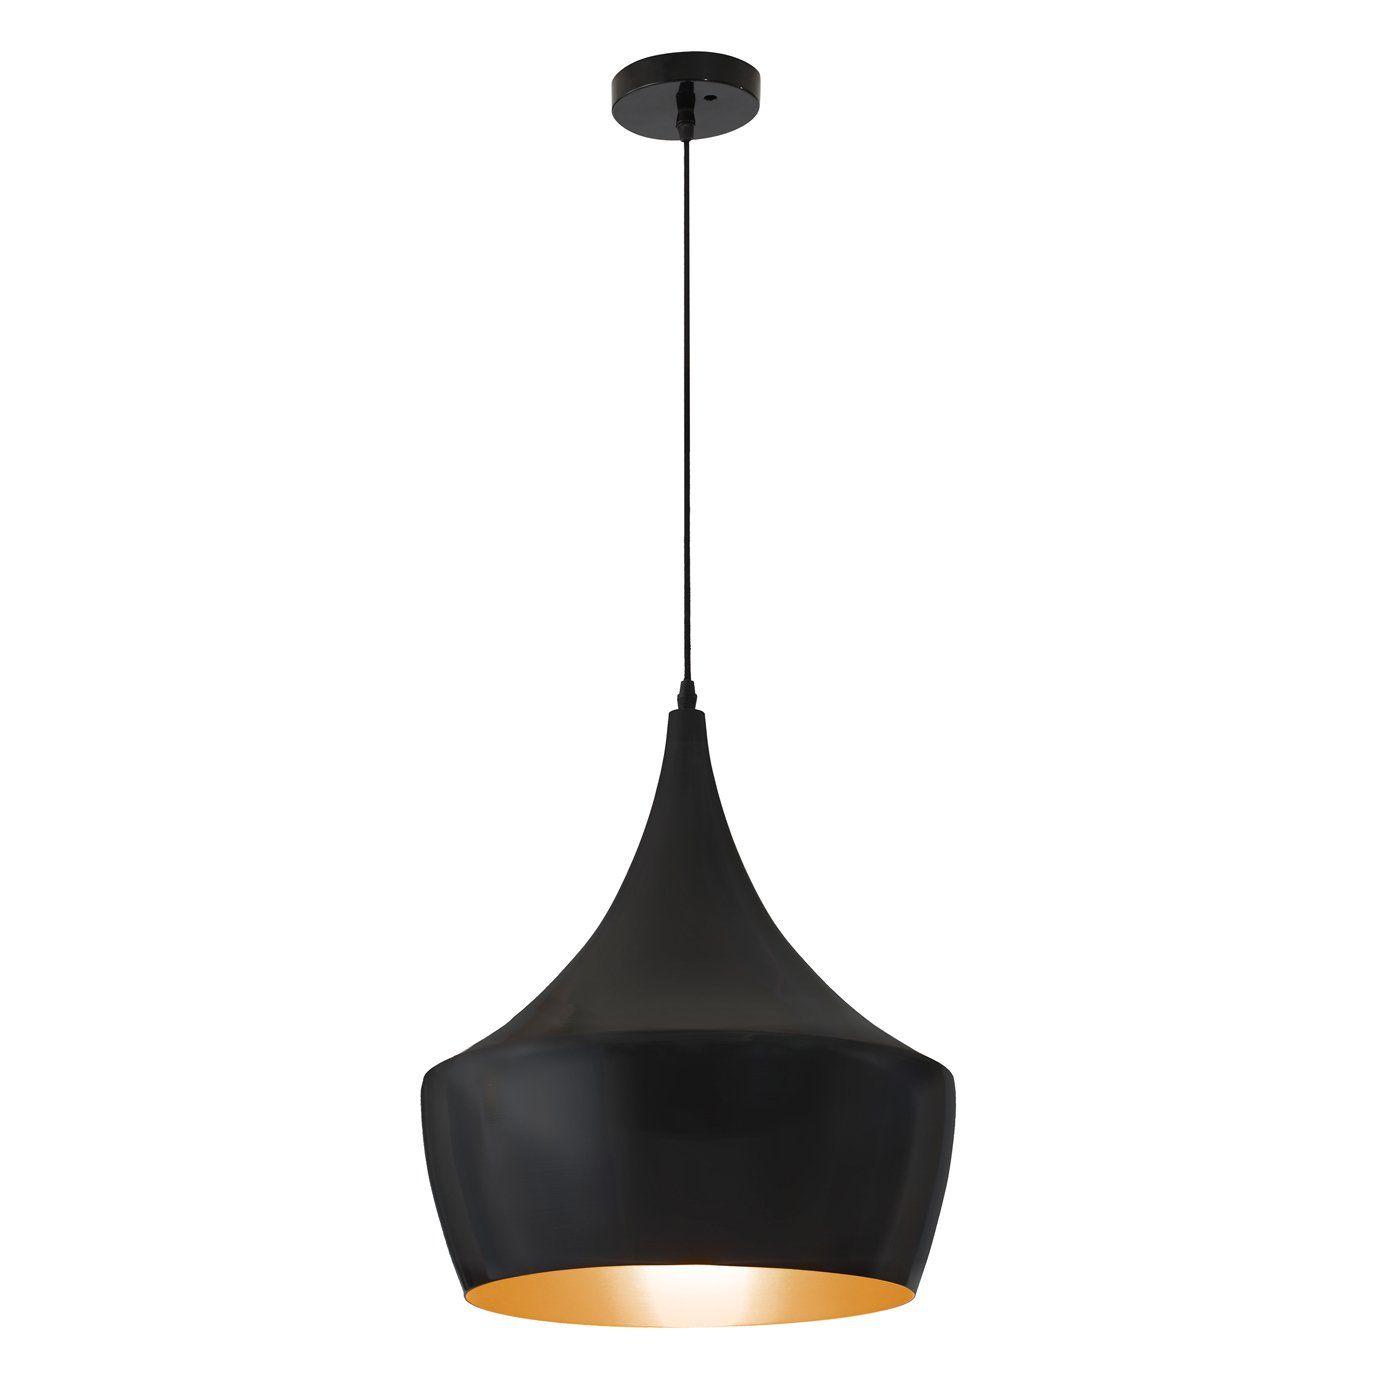 Zuo modern copper ceiling lamp loweus canada lighting